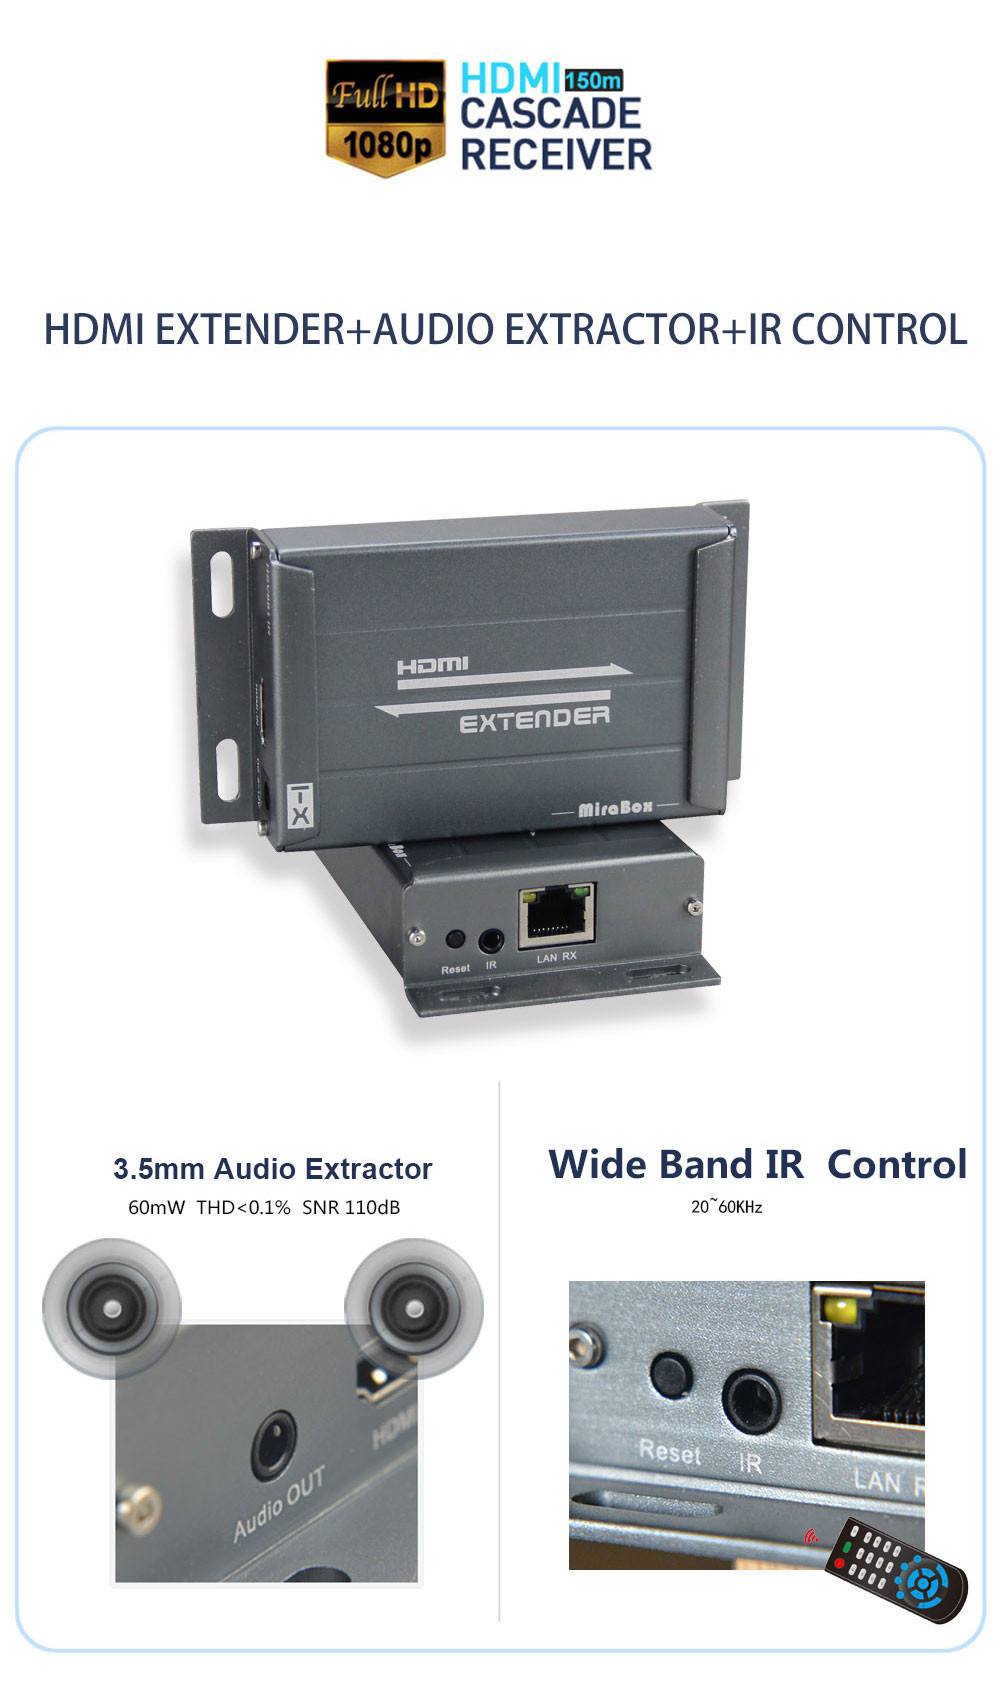 HDMI-EXTENDER-HSV891IR_08